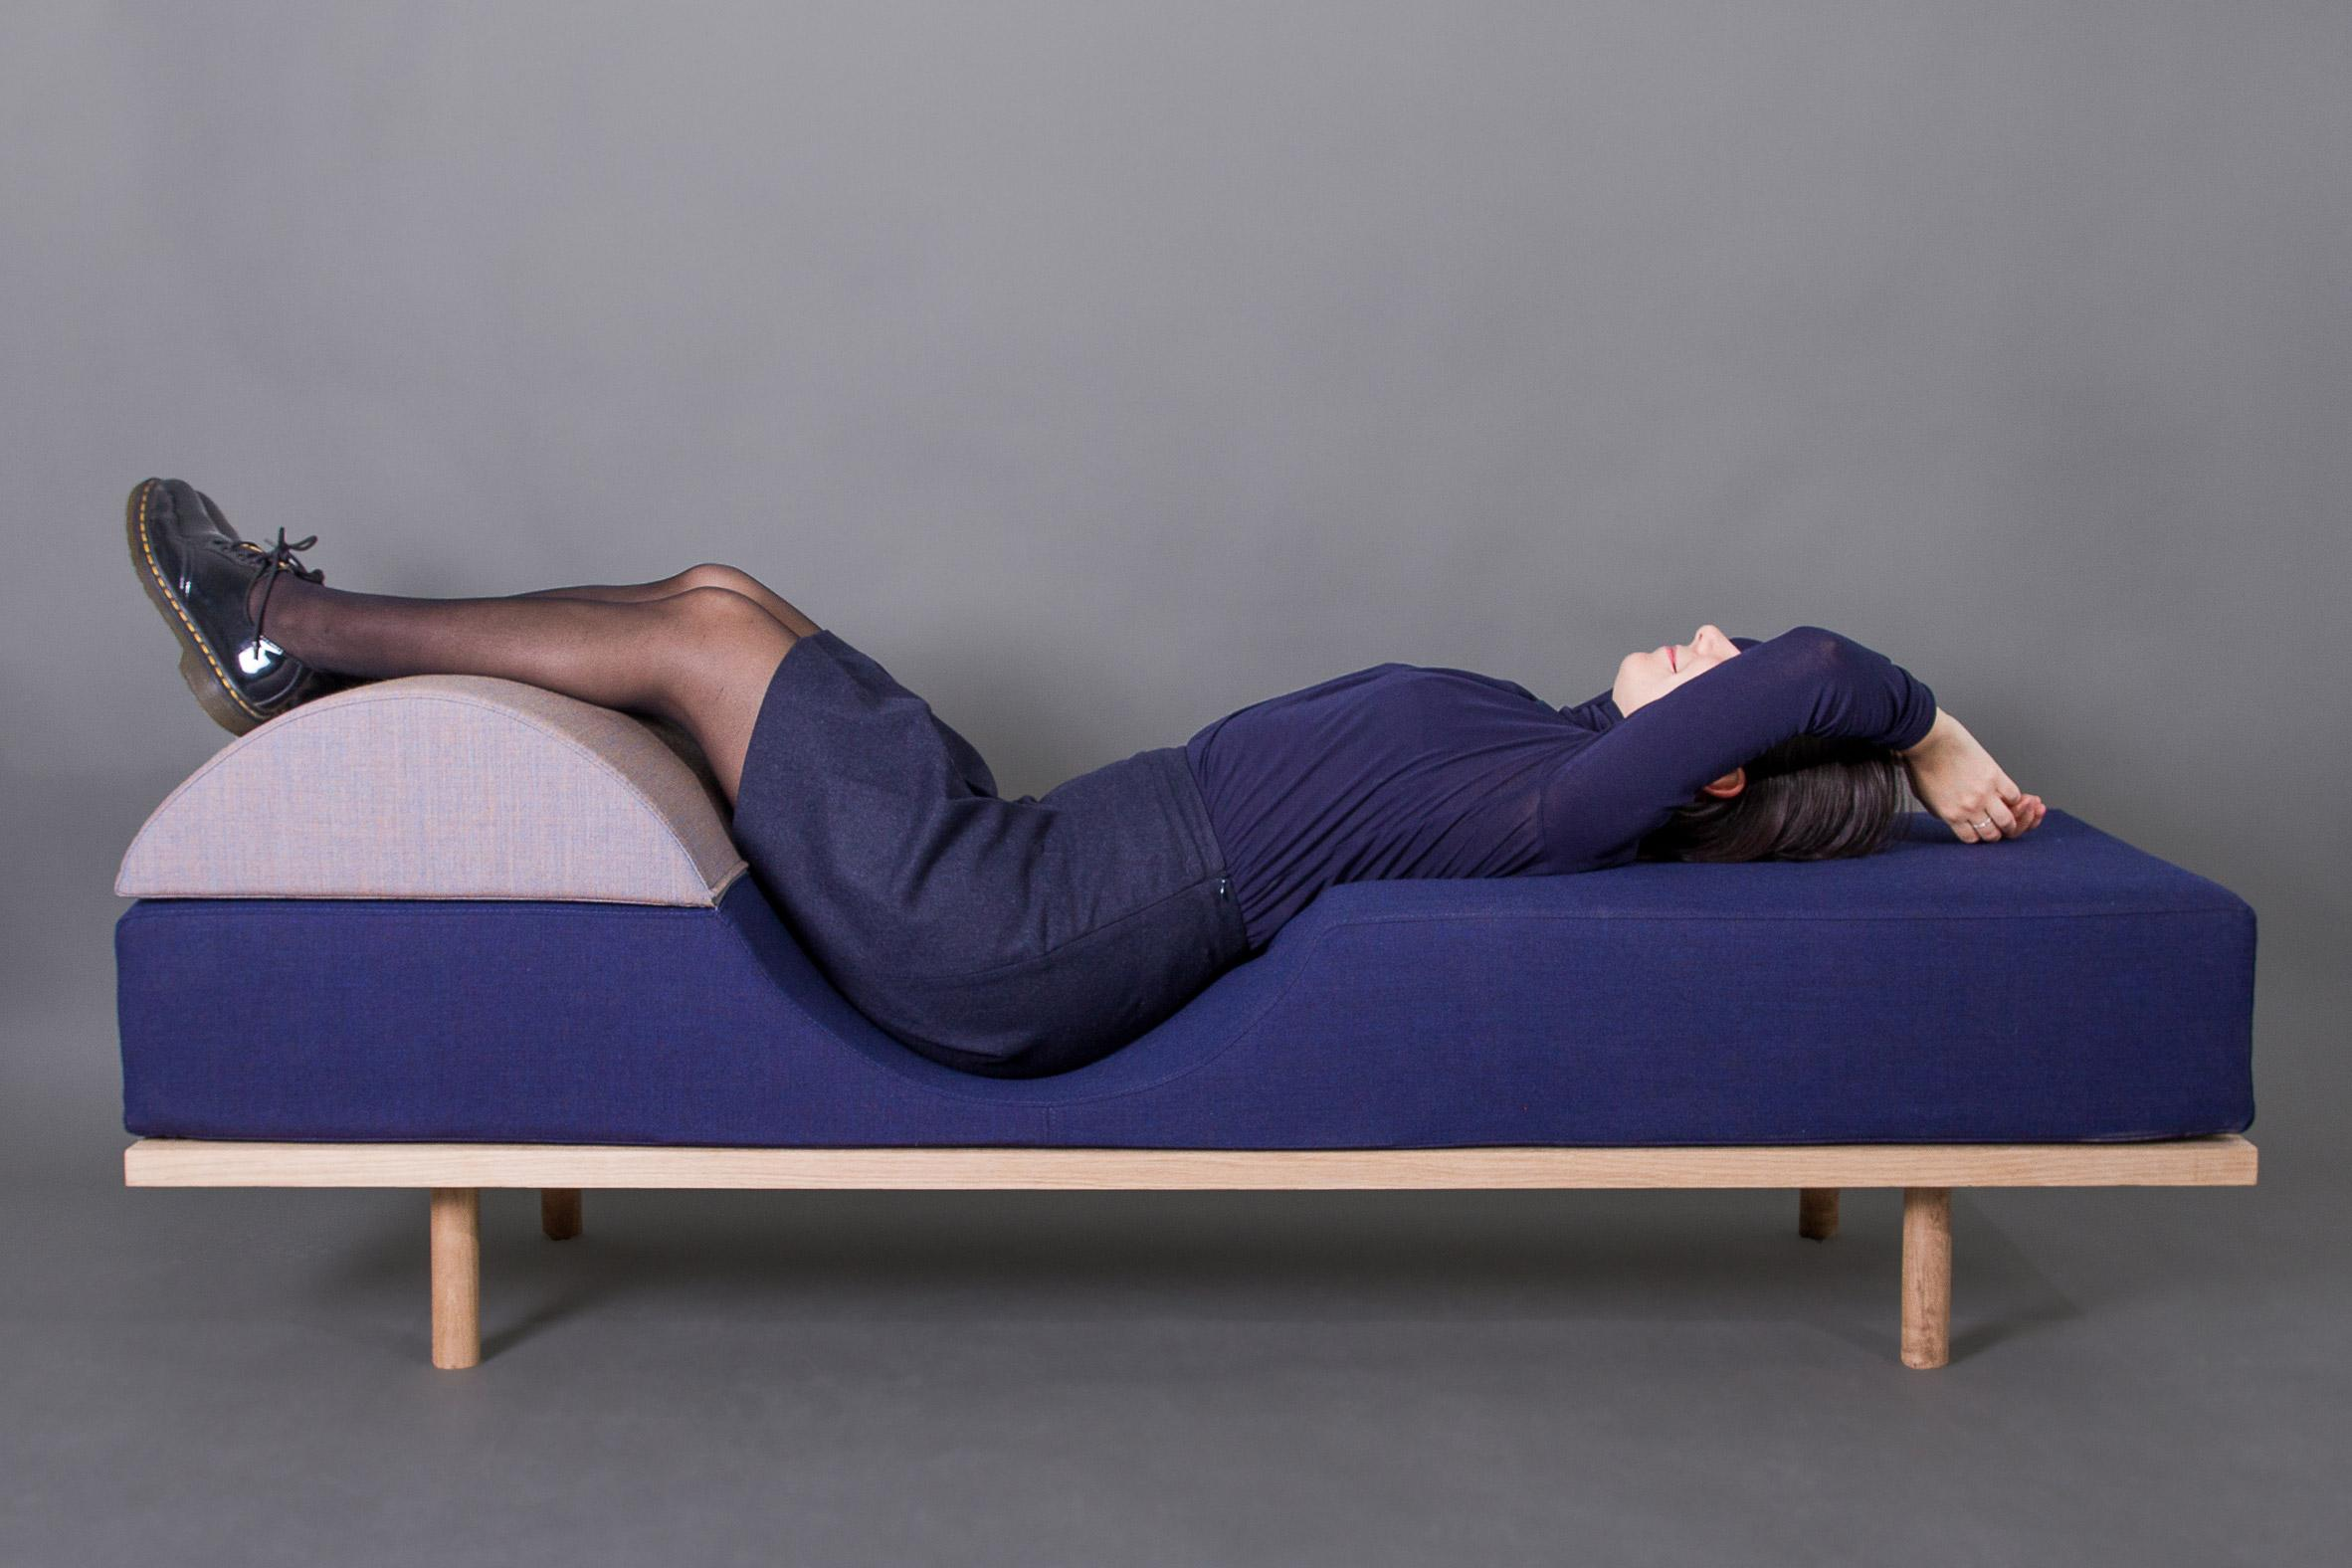 furniture-for-a-norvegian-prisiners02